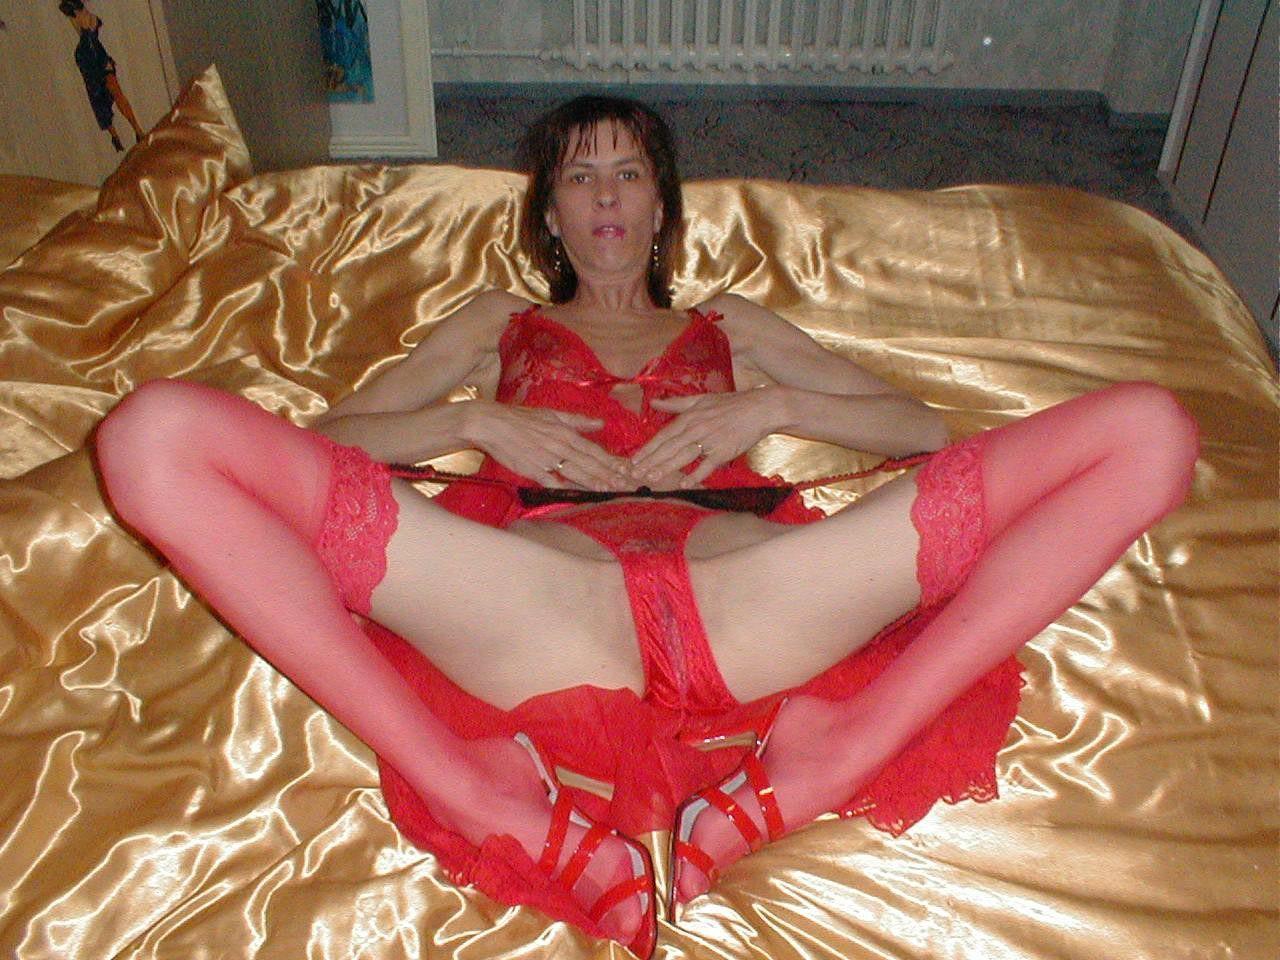 http://pbs-2.adult-empire.com/85/8570/028/pic/3.jpg